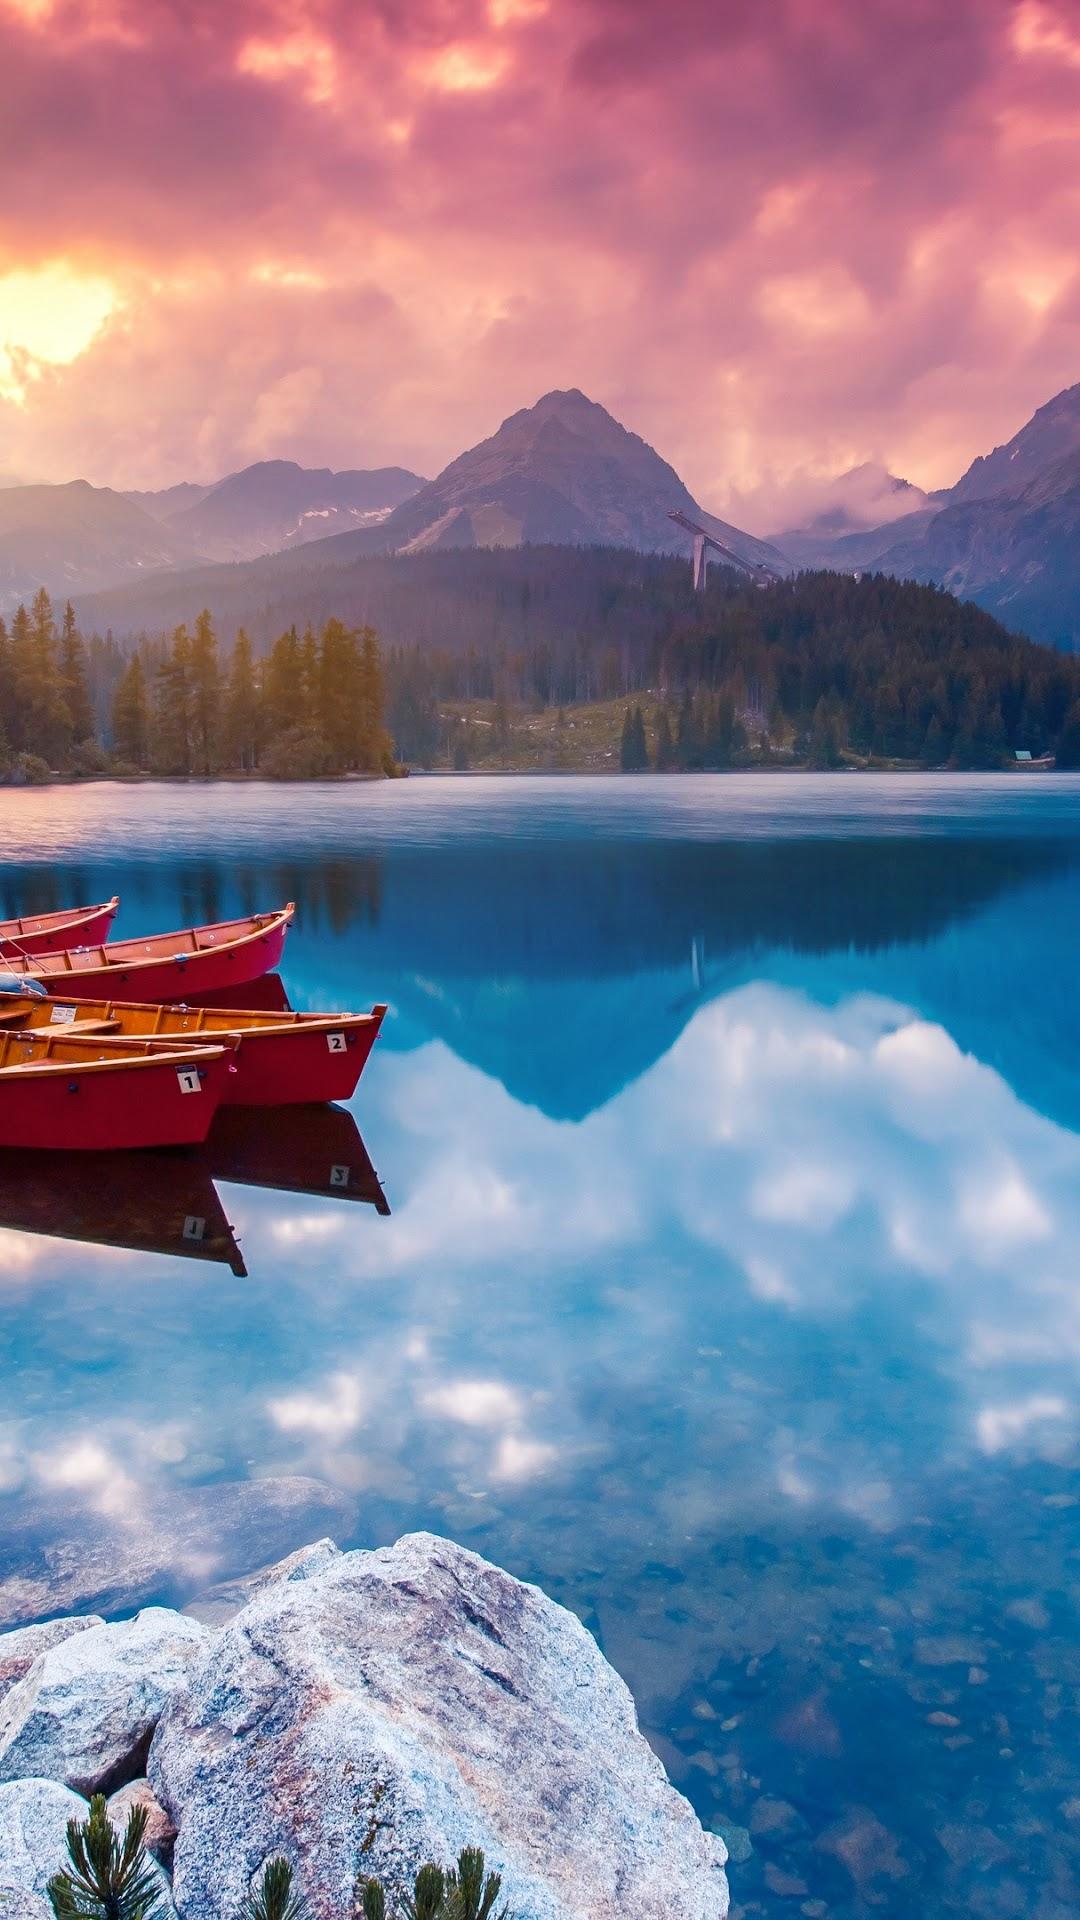 Sunrise Nature Lake Mountain Scenery 4k Wallpaper 149